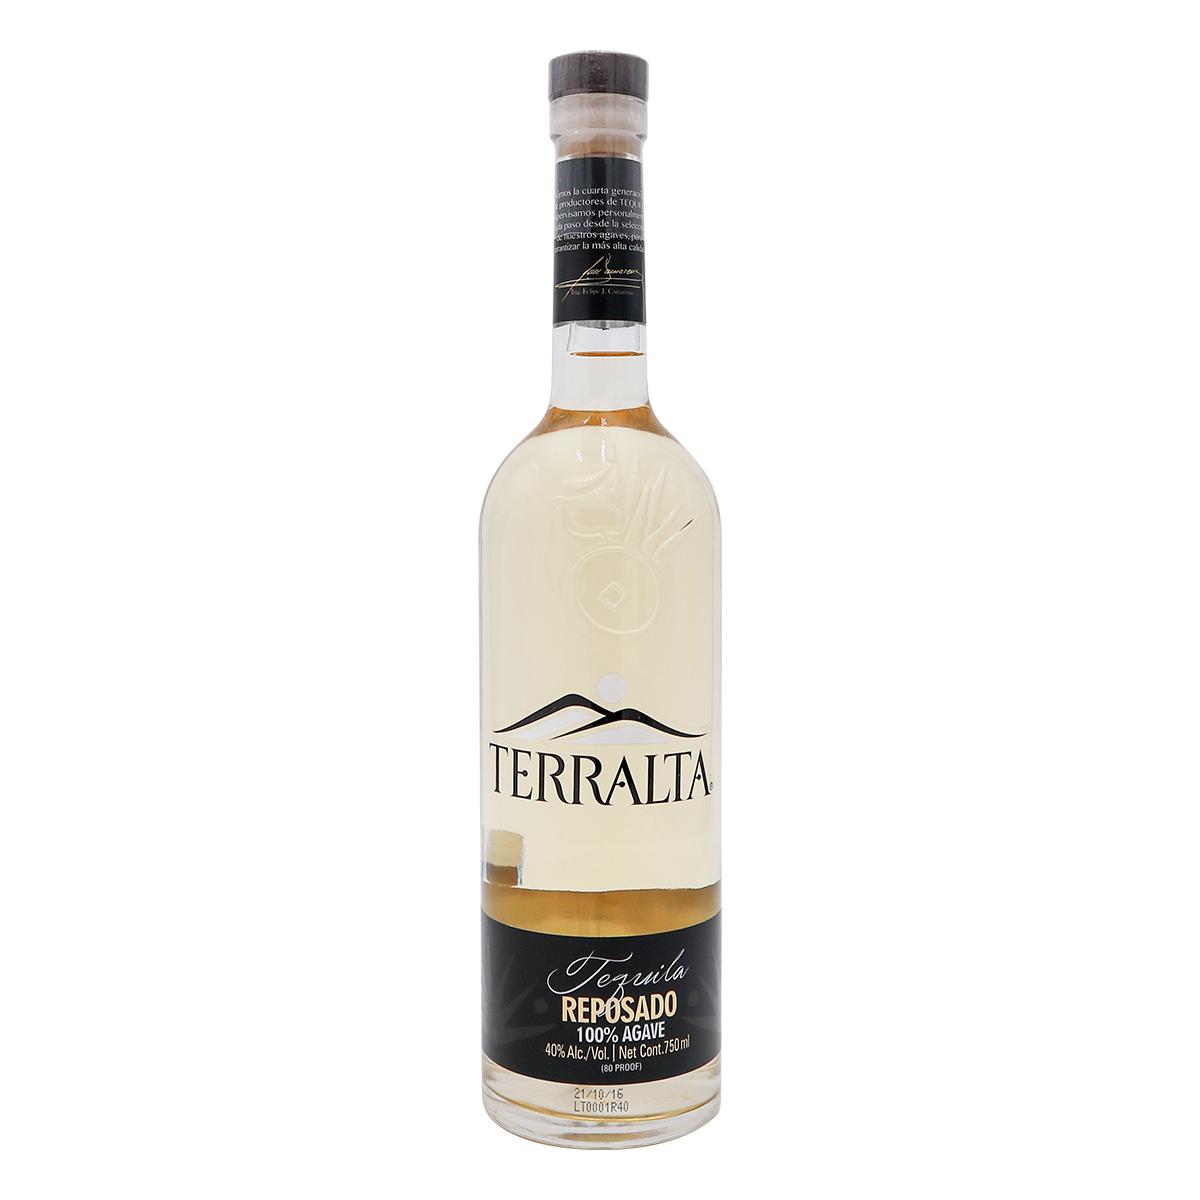 Terralta Reposado Tequila kaufen